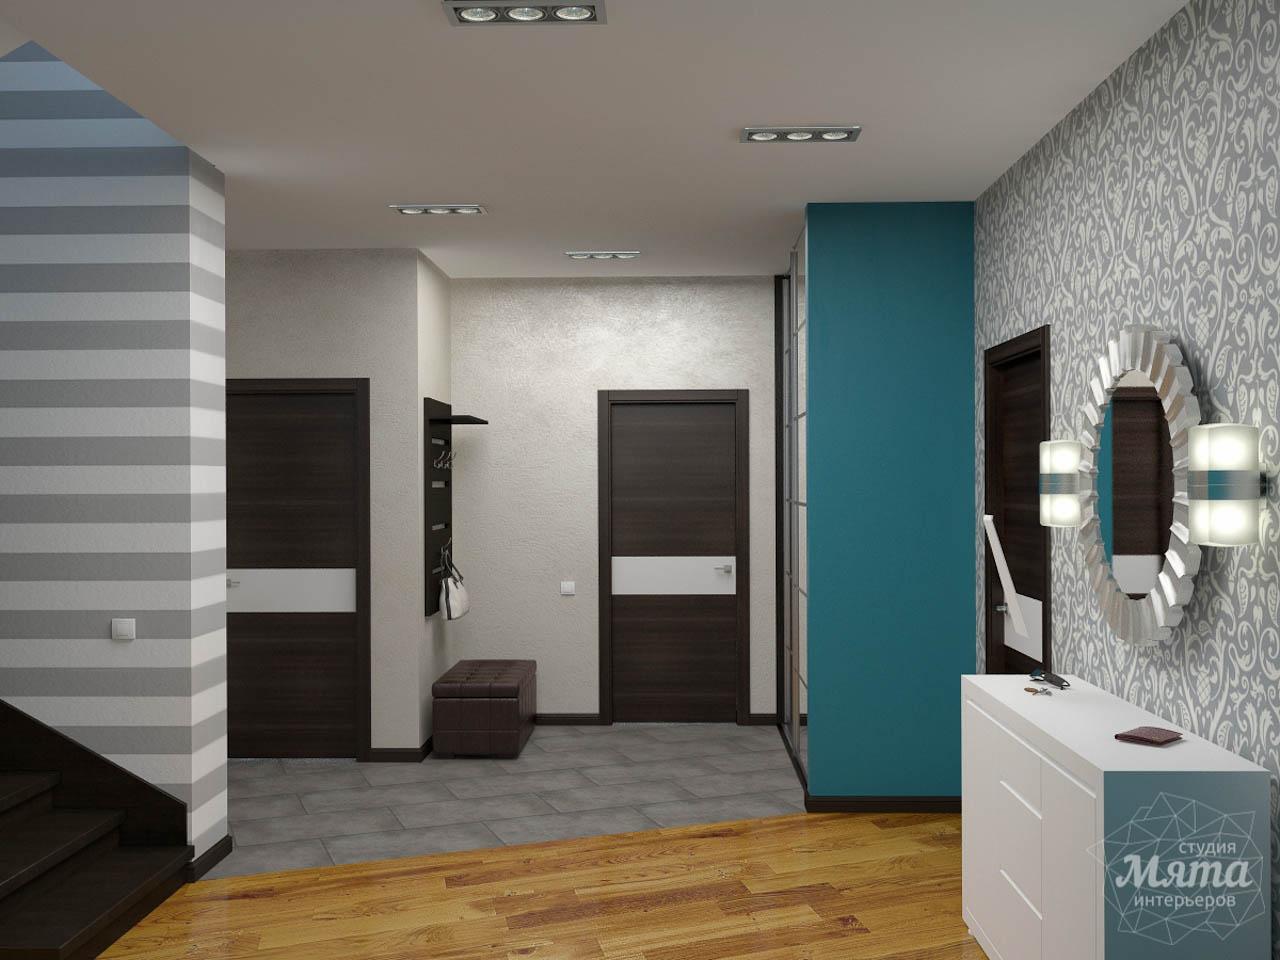 Дизайн проект интерьера коттеджа  в стиле минимализм по ул. Барвинка 15 img1613423501